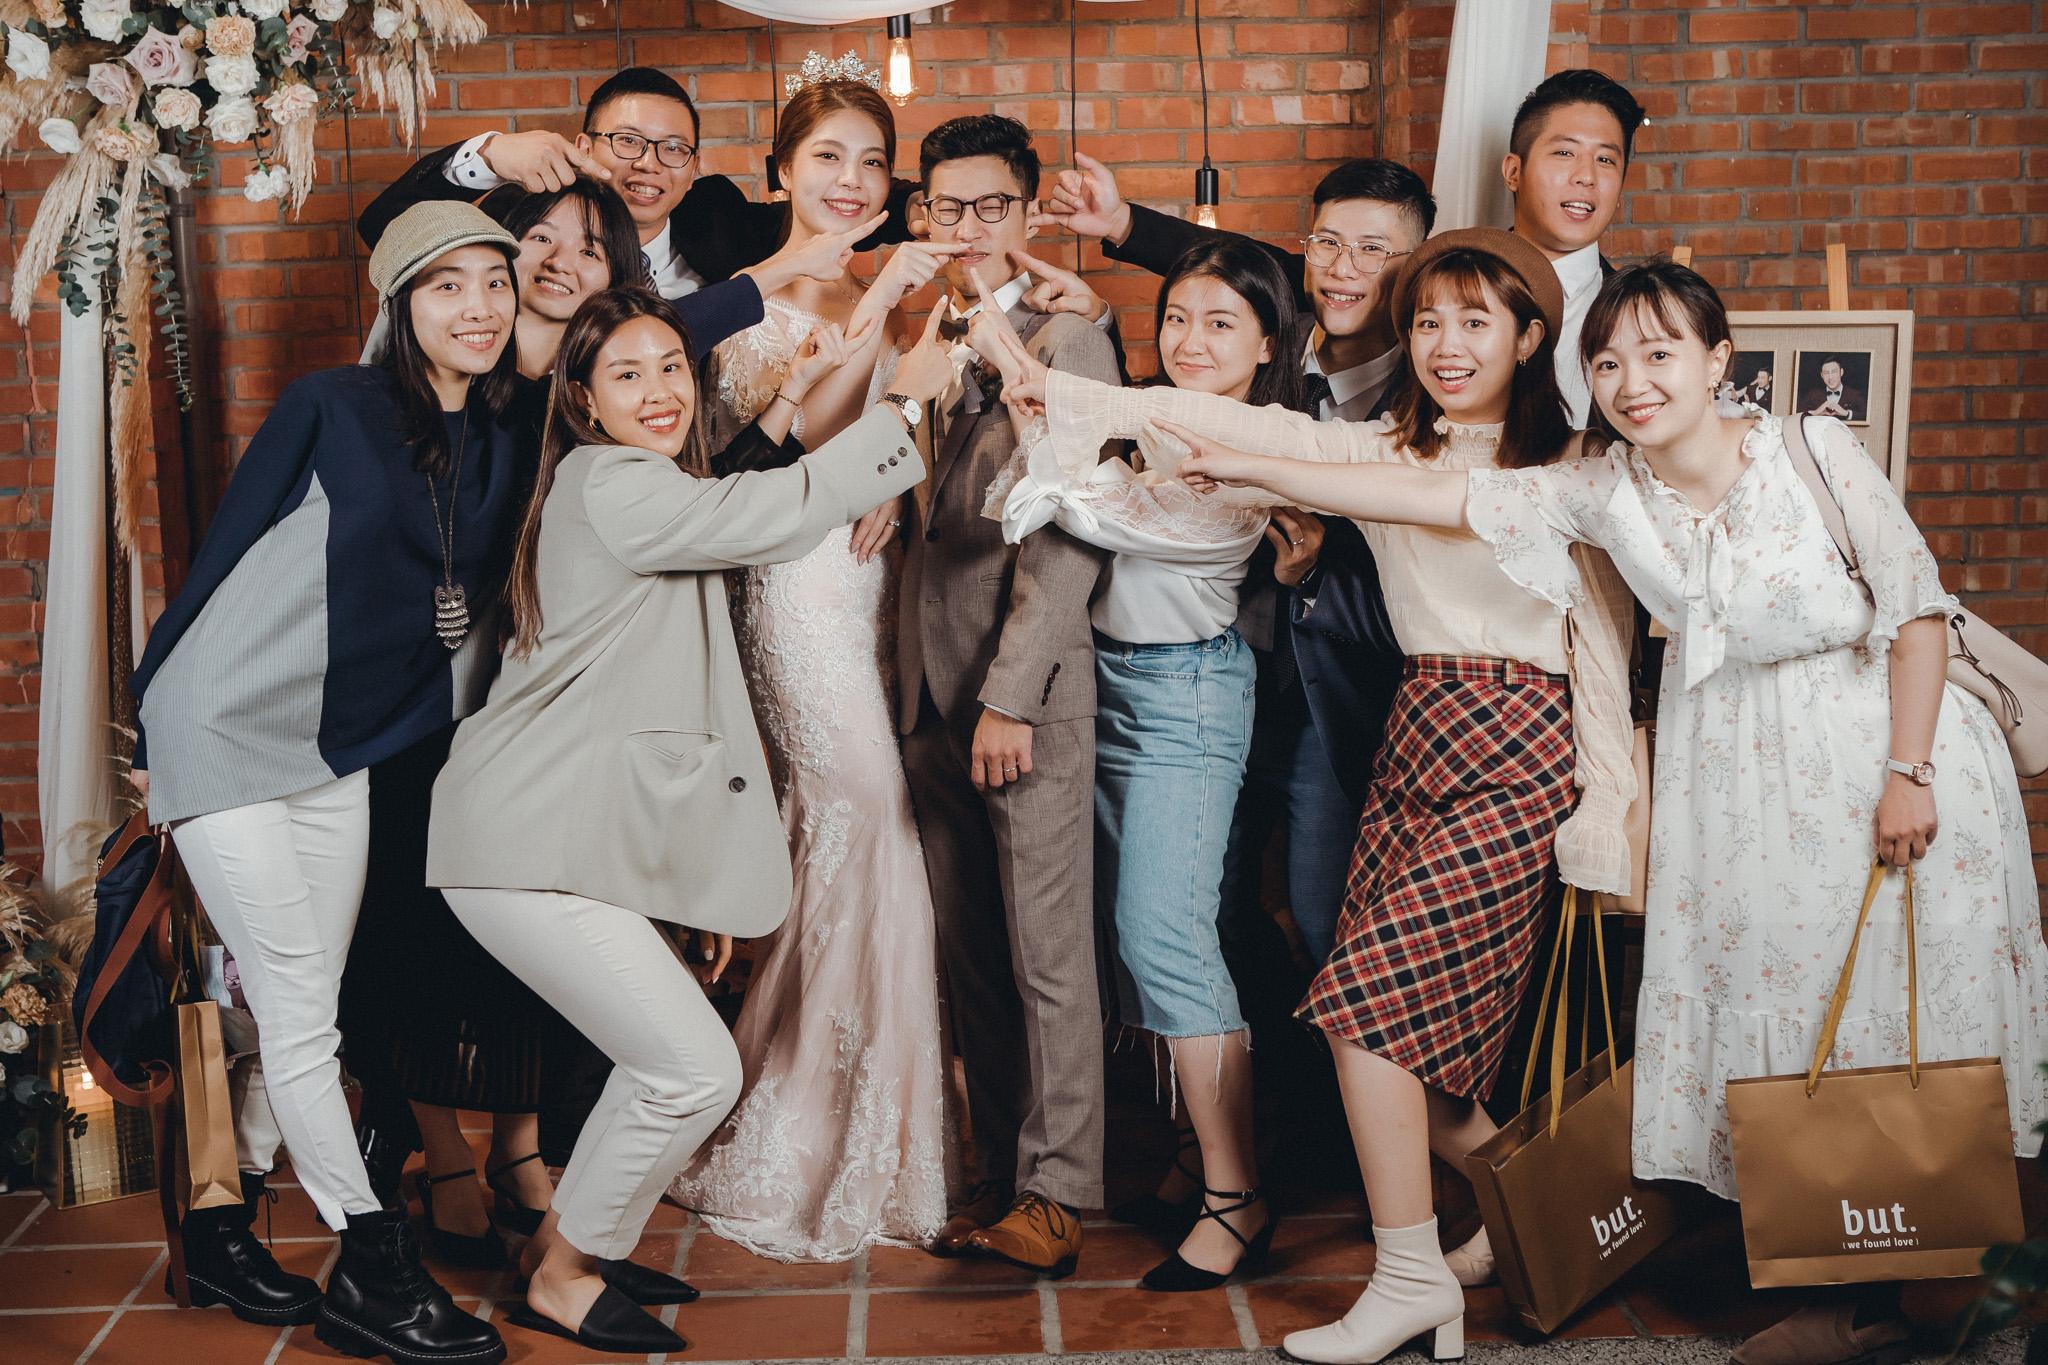 EW 台北婚攝 居米 濟南教會 Brick Yard 33 美軍俱樂部 婚禮 婚宴-113